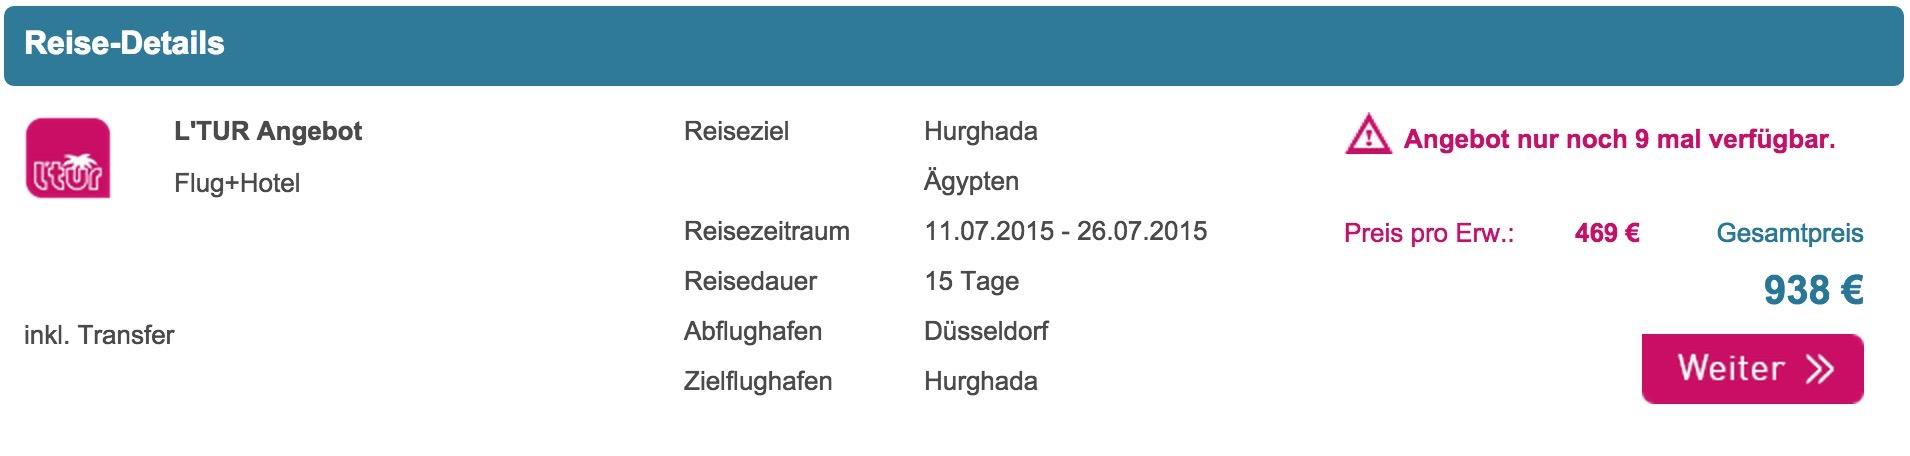 CapturFiles-Juli-09-2015_08.16.36